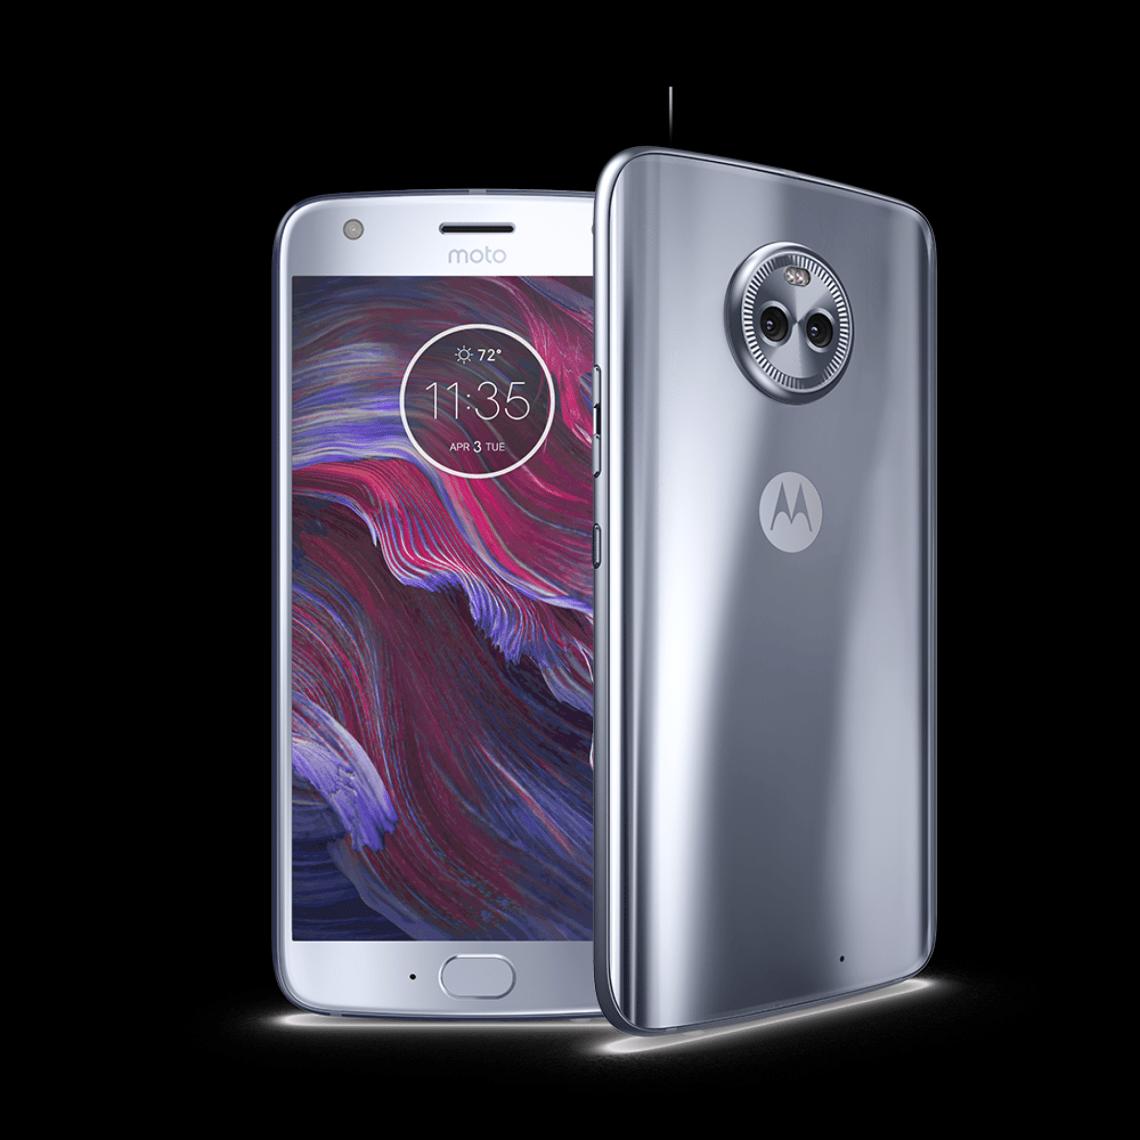 moto x⁴ - Android smartphone | motorola US